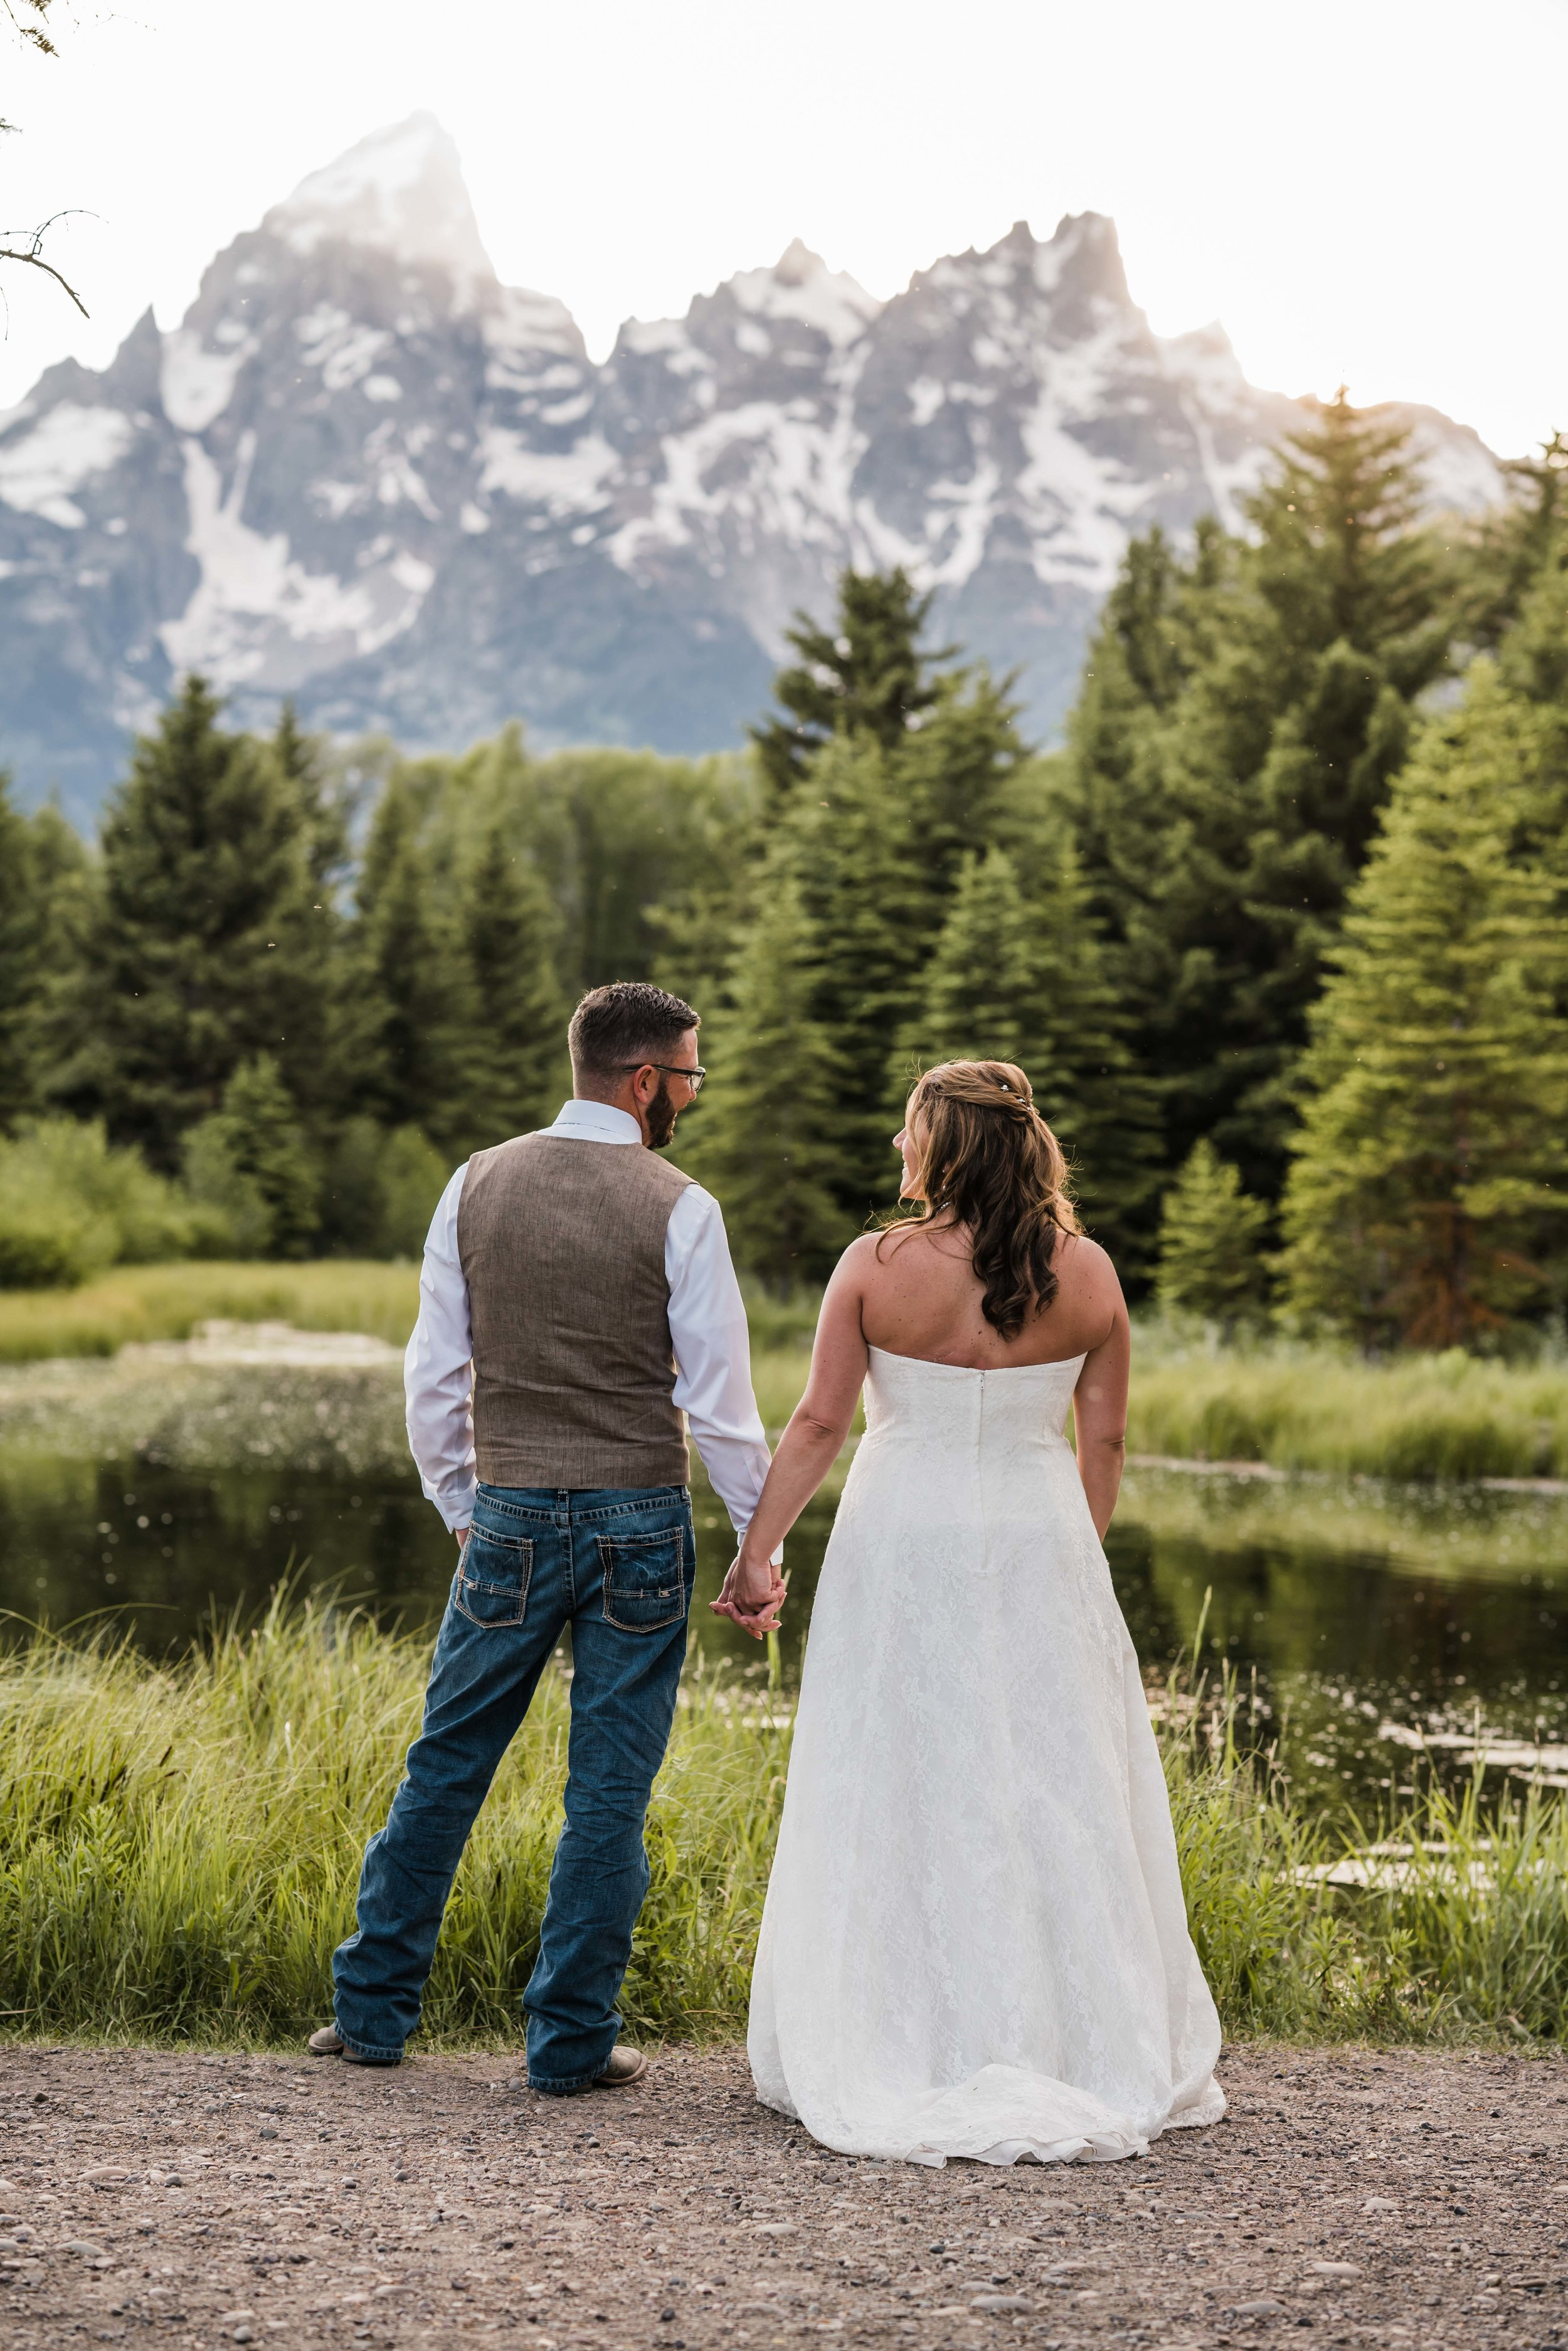 jackson hole adventure wedding photography at schwabachers landing in GTNP -DSC04293.jpg